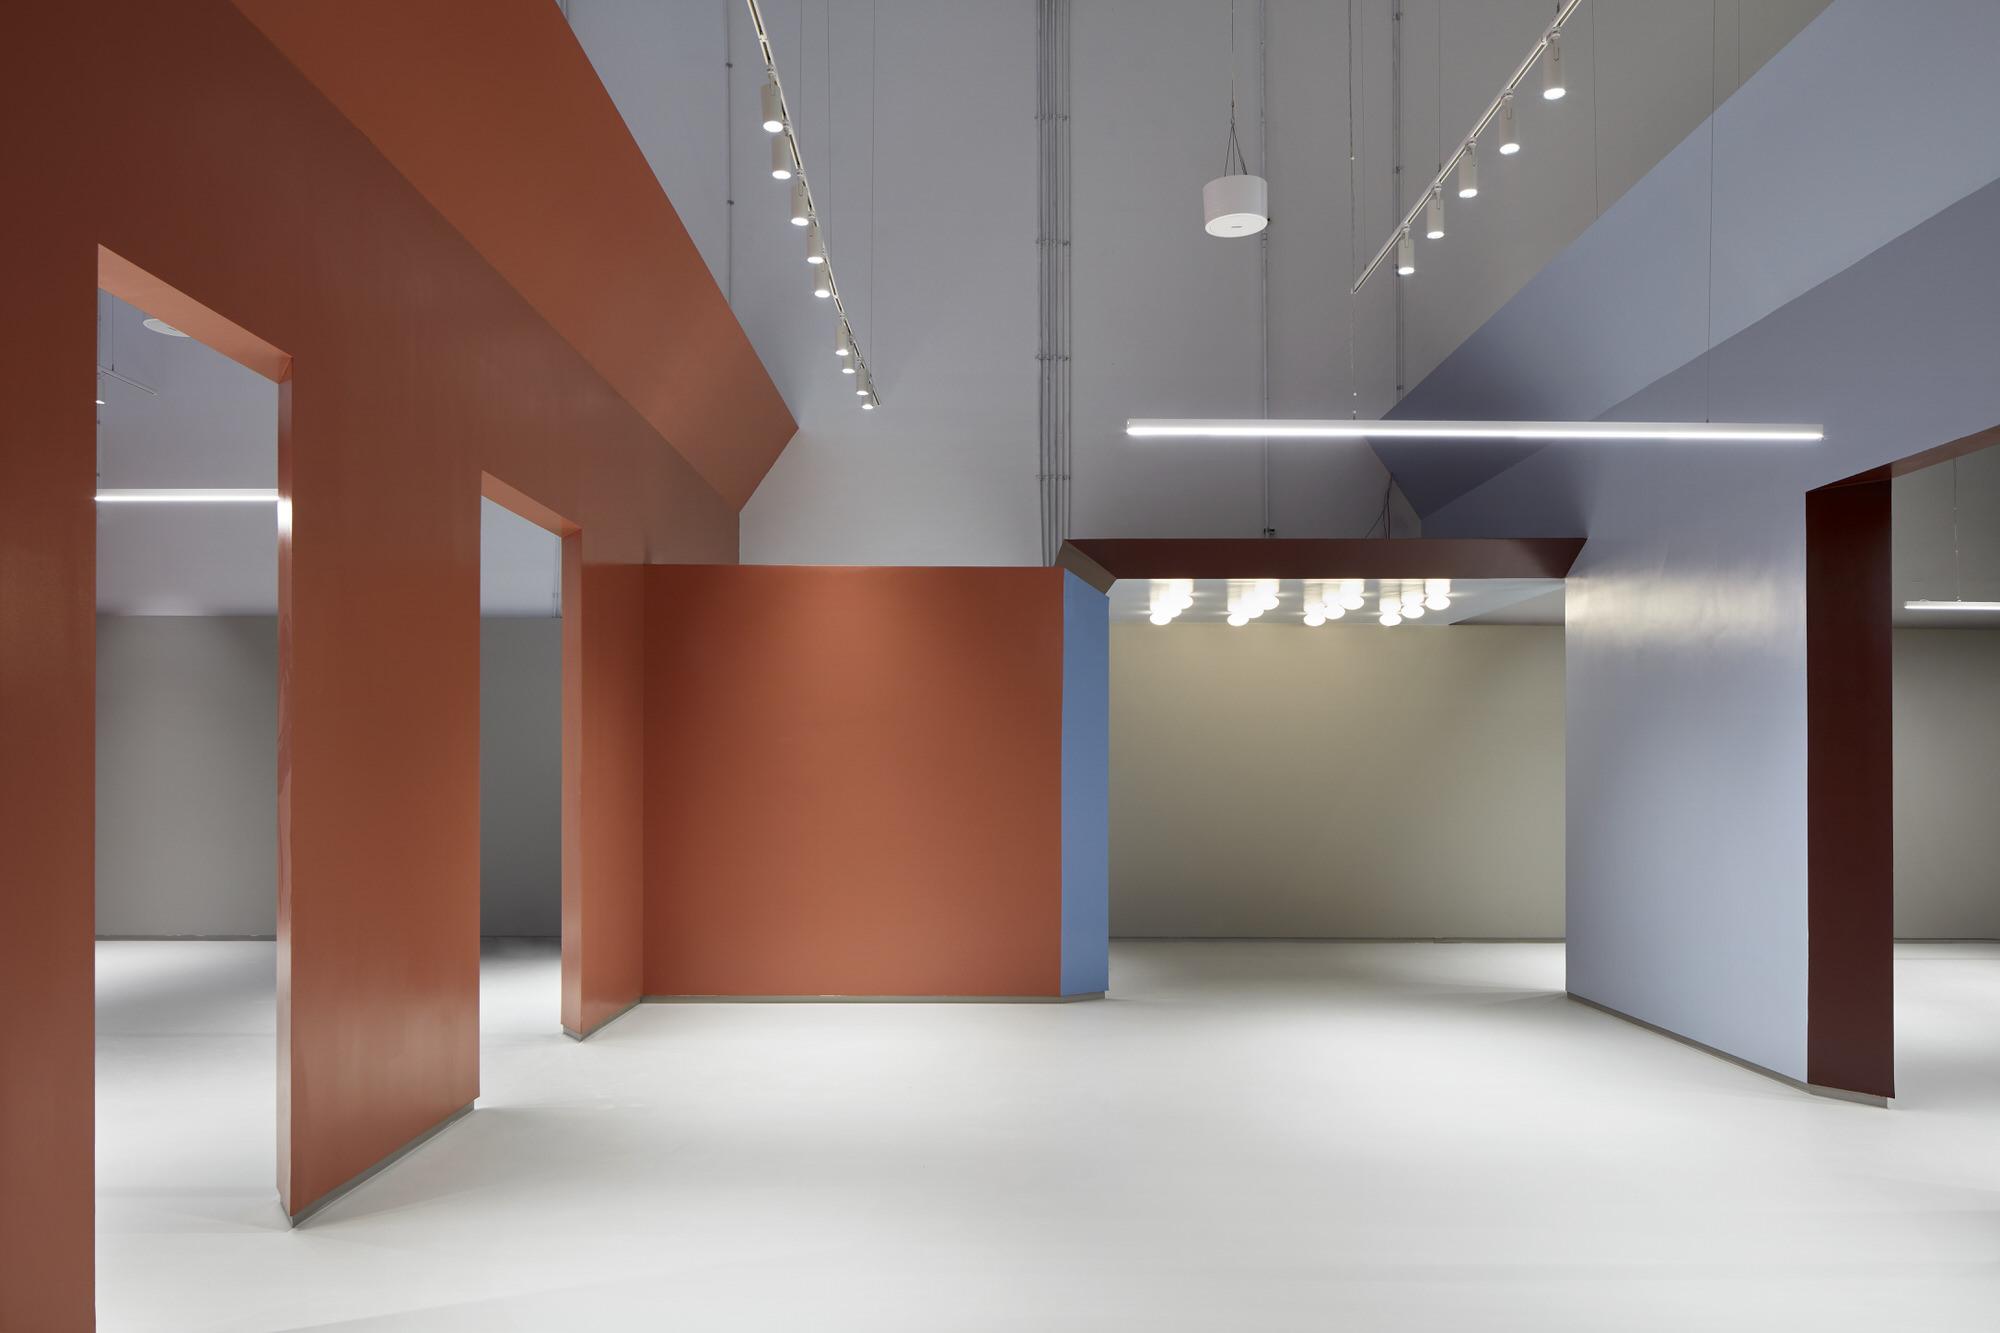 Baranowitz Goldberg Kaza Israel Showroom Interior Design Photo Shai Gil Yellowtrace 15